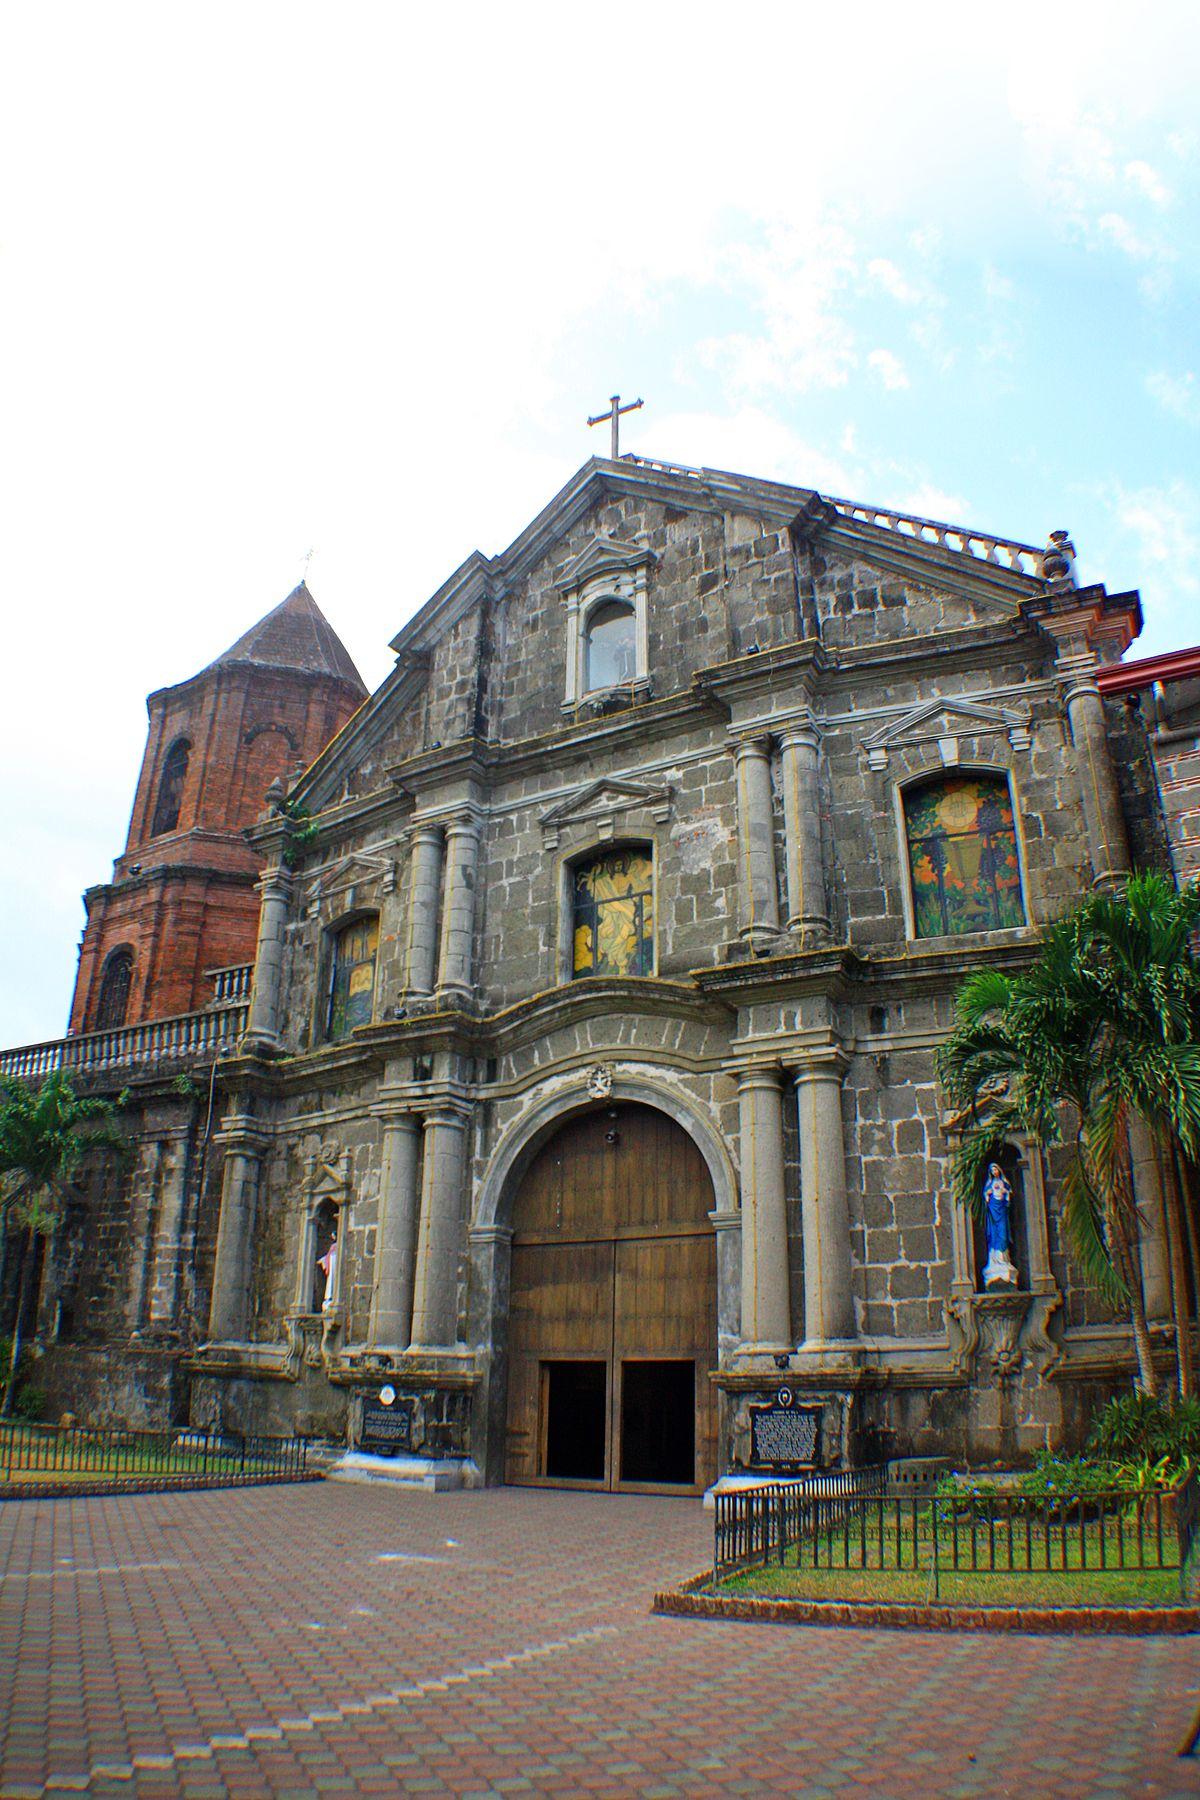 San Antonio de Padua Parish Church (Pila) - Wikipedia